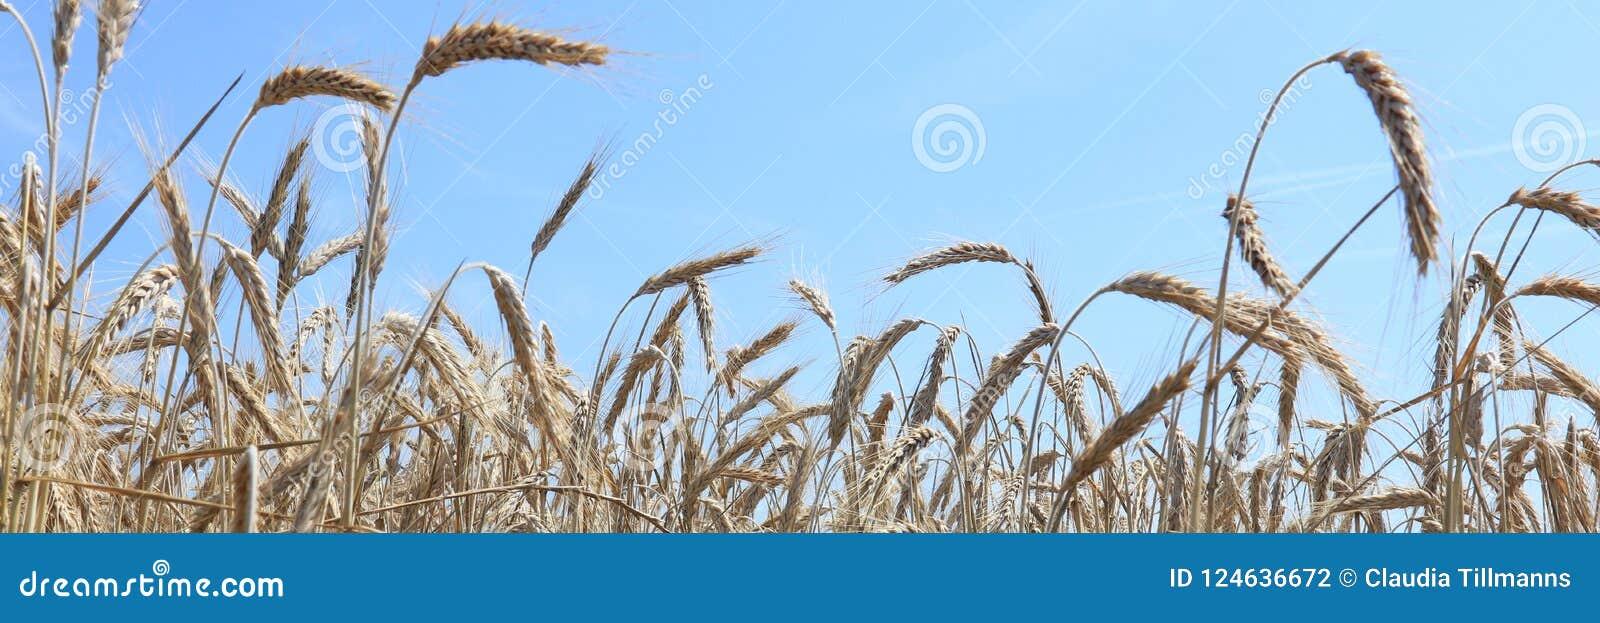 Panorama av korn